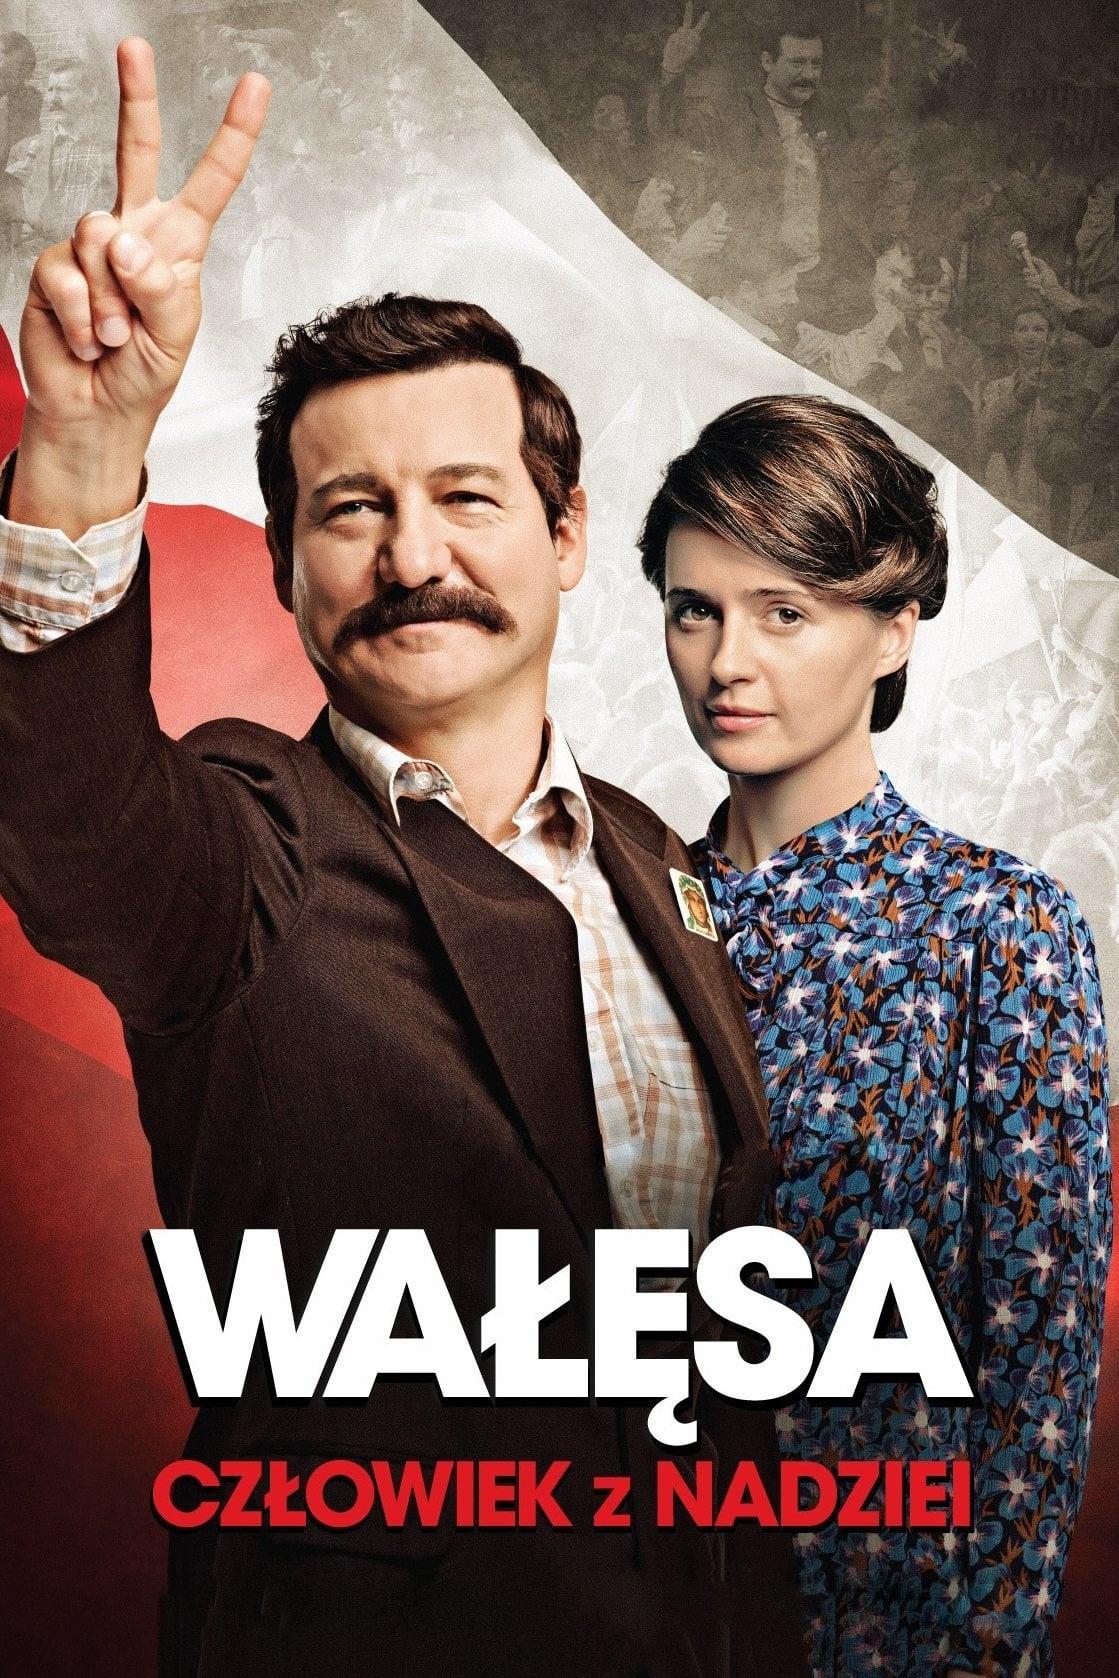 Walesa: Man of Hope (2013)